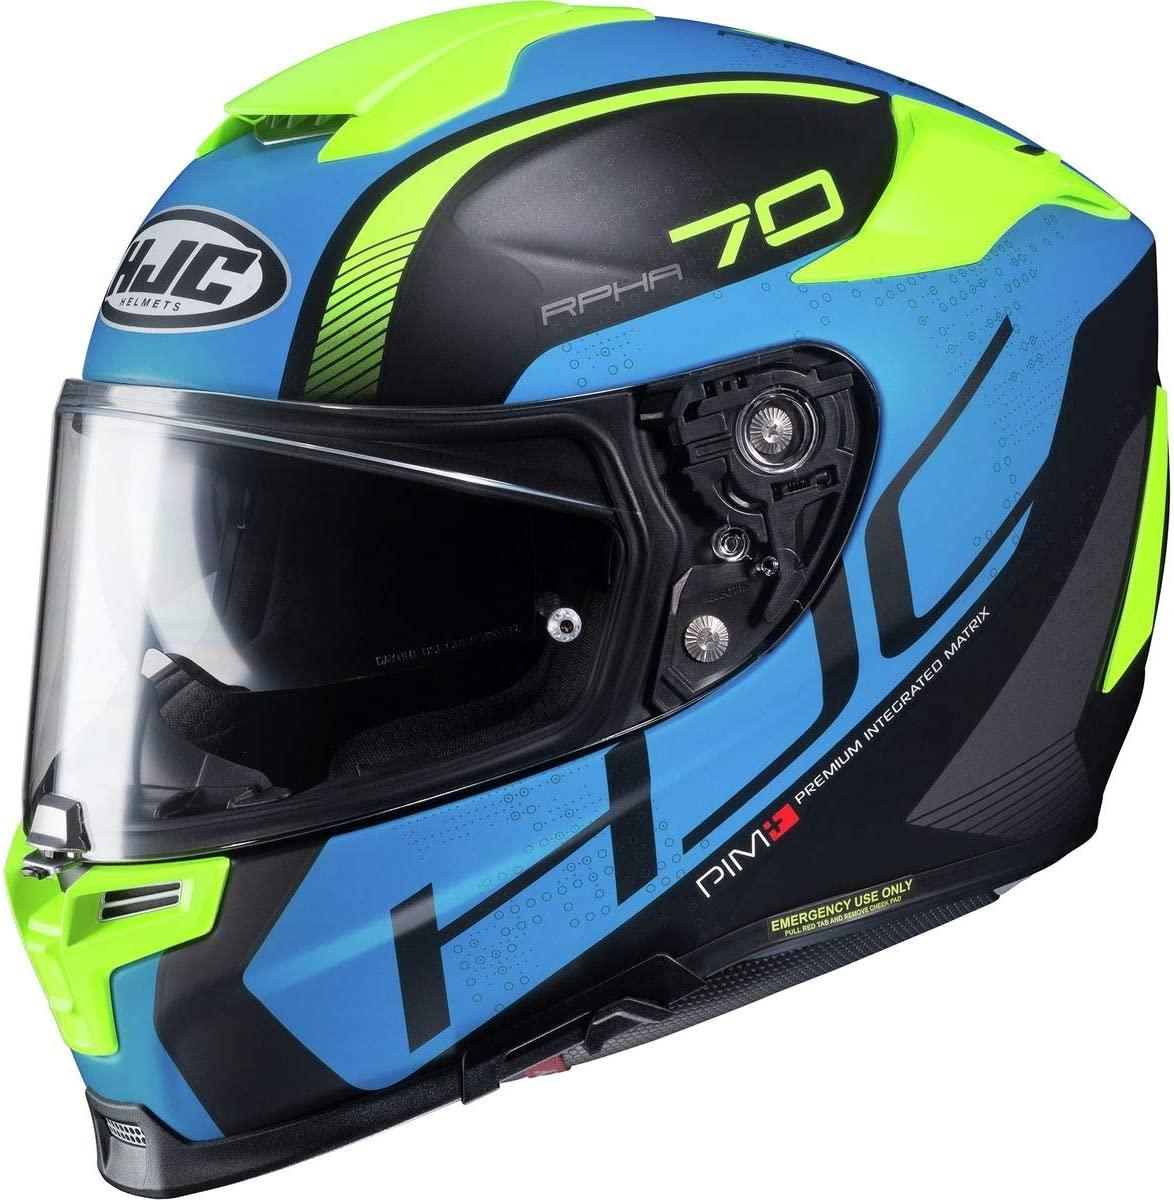 HJC RPHA 70 ST Vias Men's Street Motorcycle Helmet - MC-2SF / Small